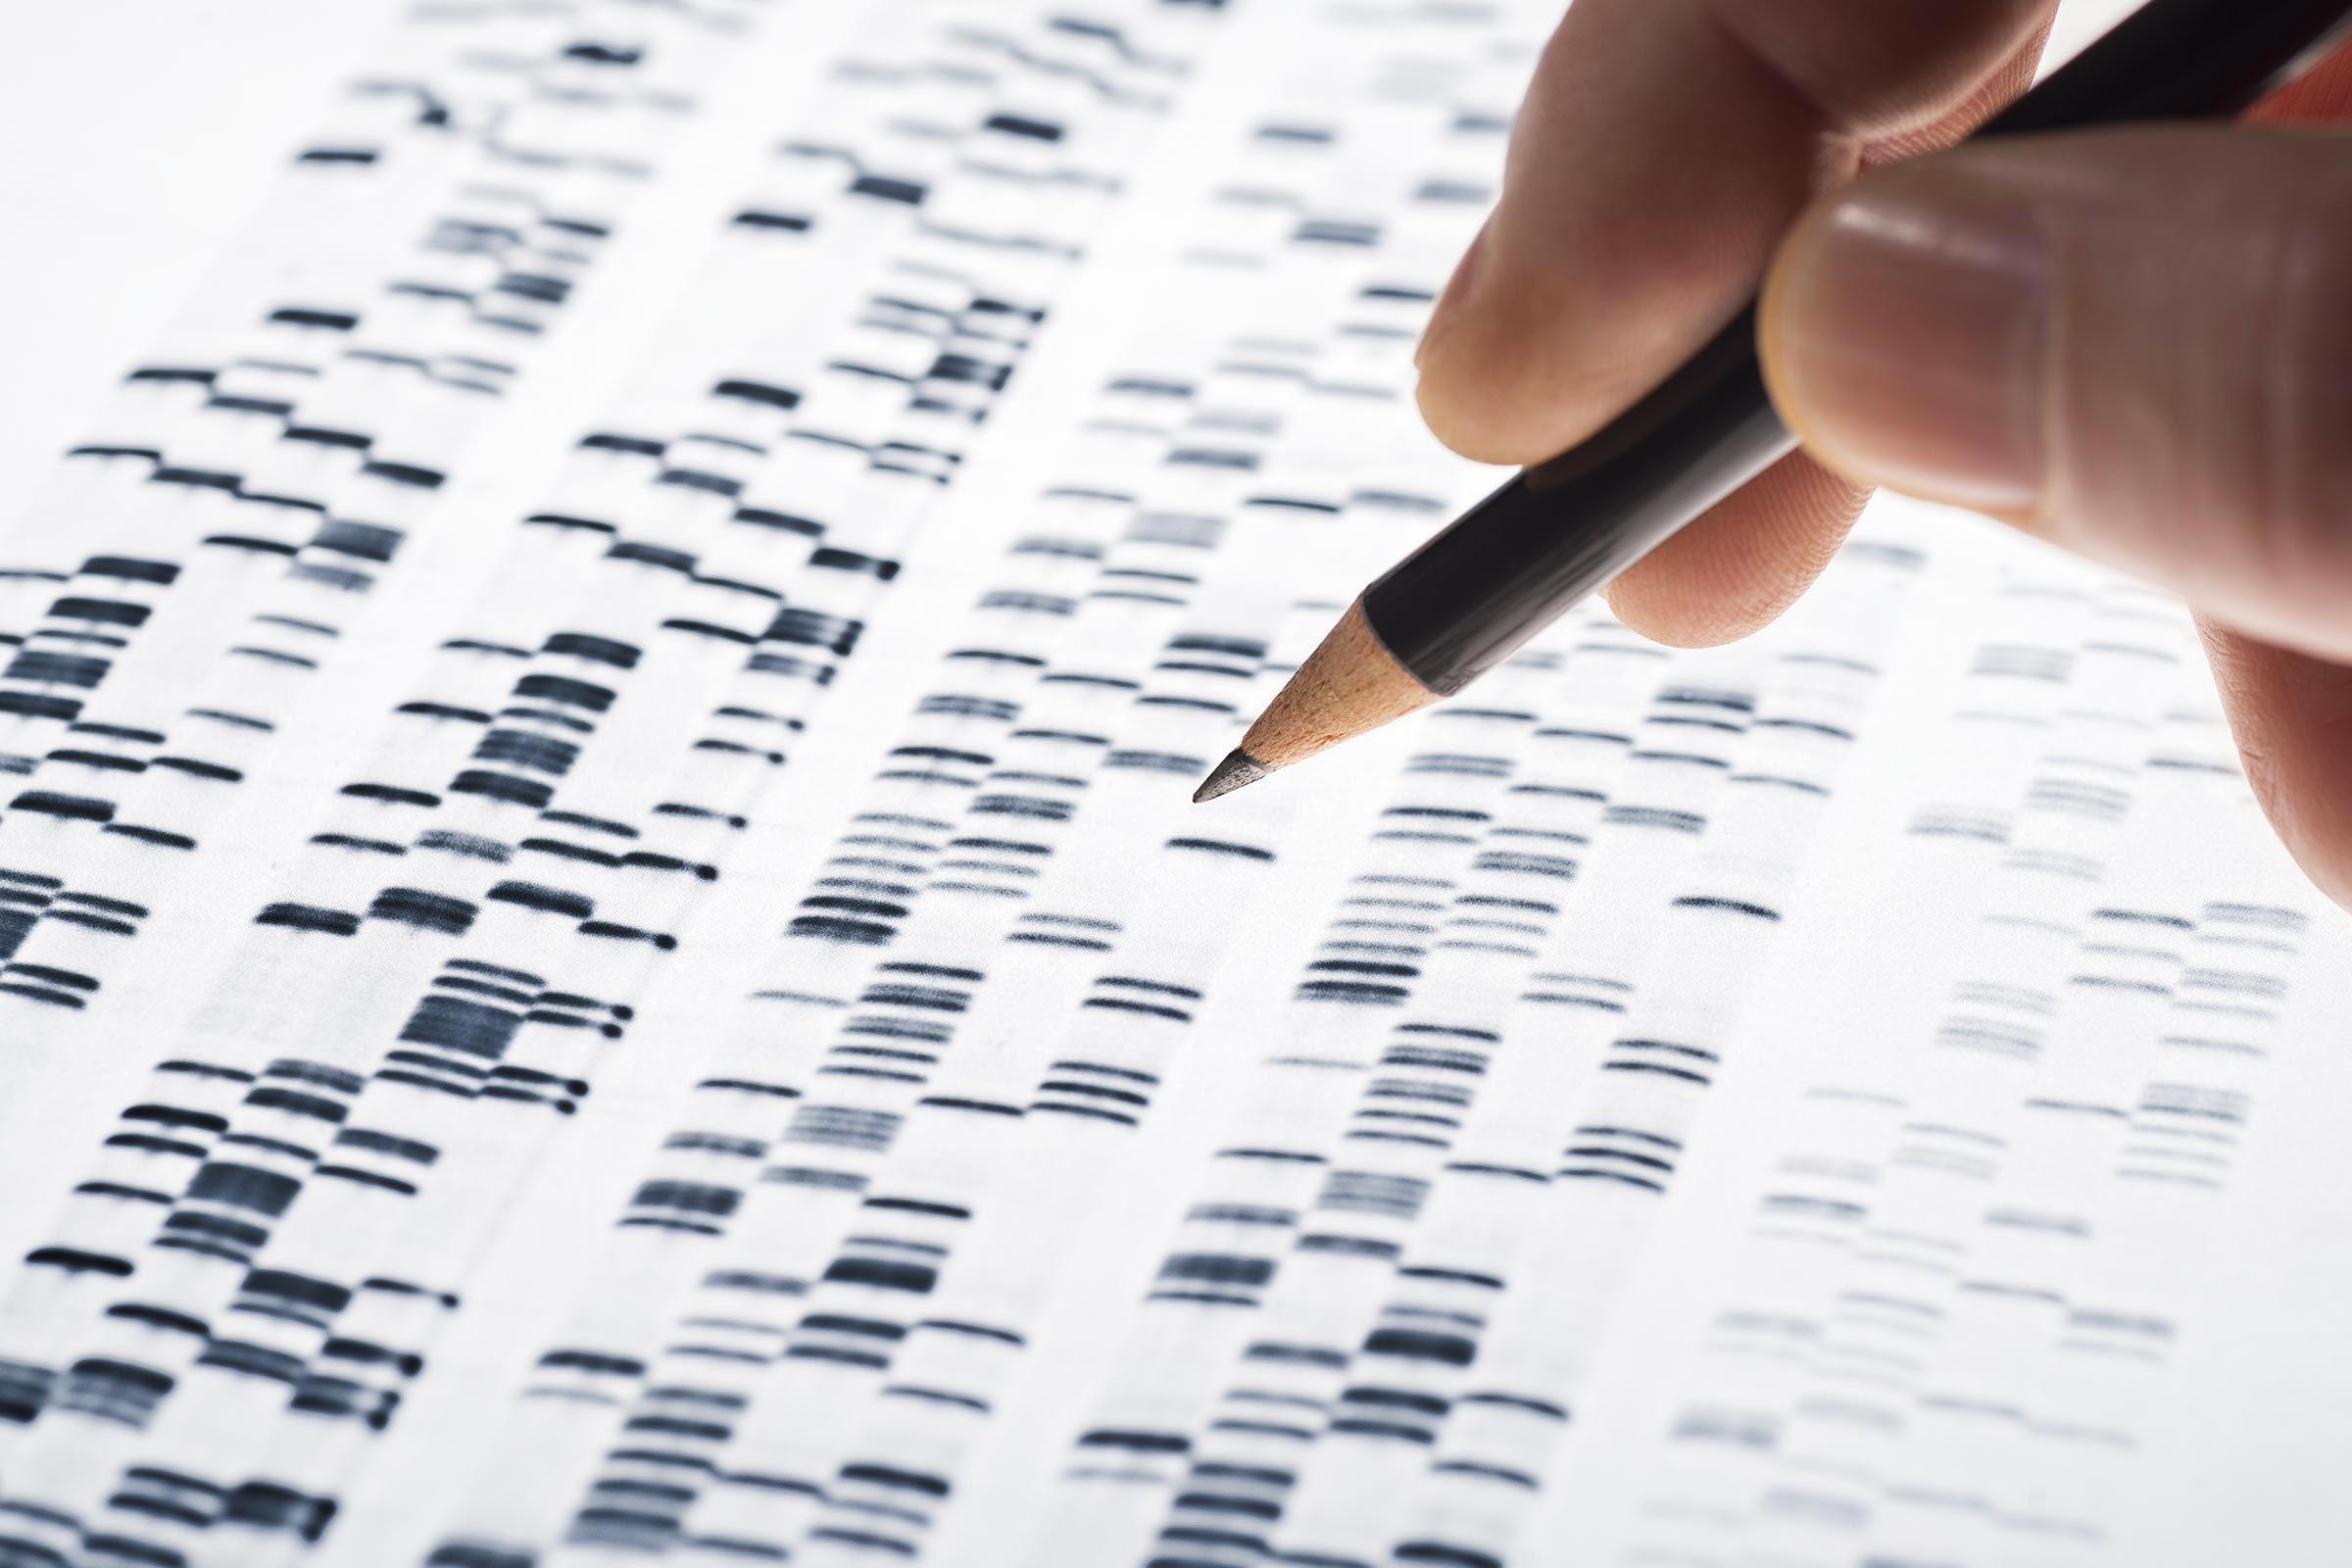 Remède à l'arthrite : les médicaments fabriqués à base de gènes humains.